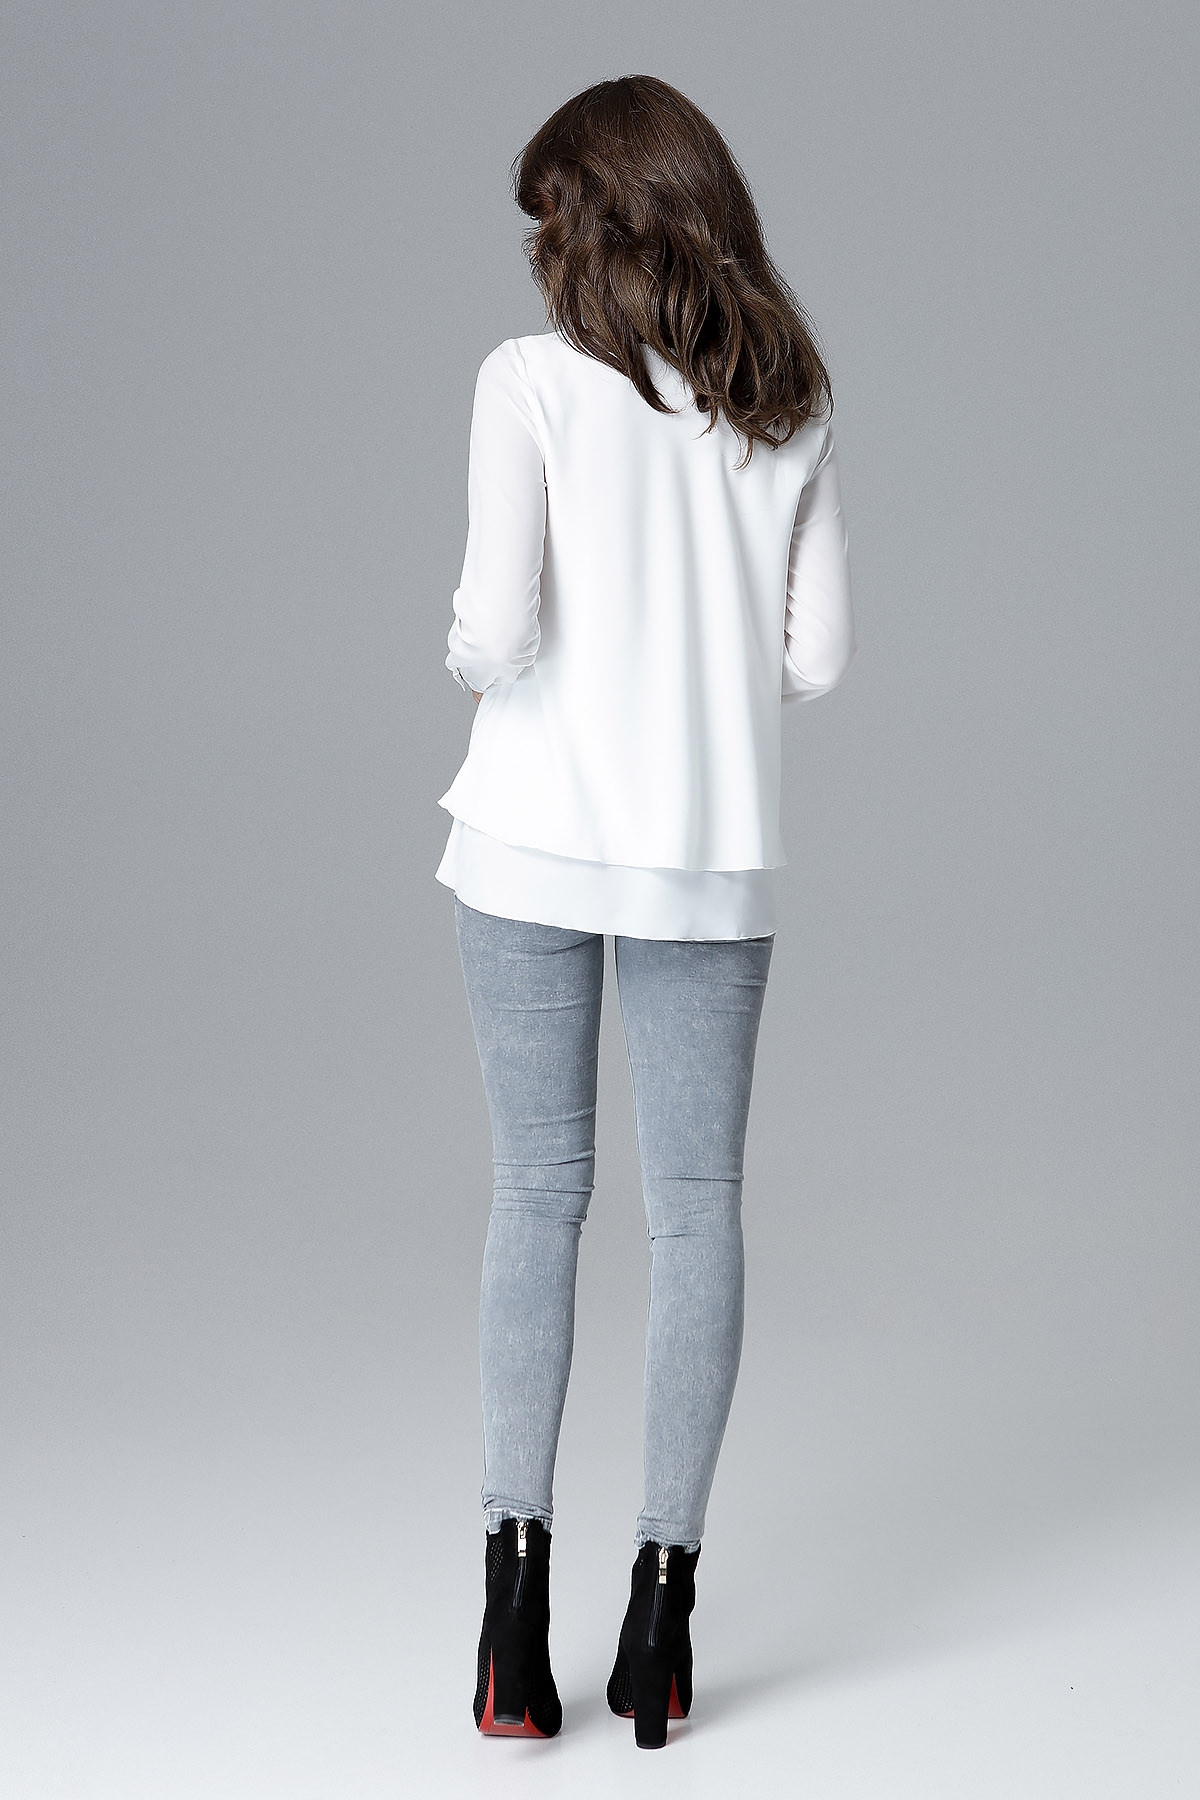 CM4157 Luźna bluzka damska z falbanką - ecru